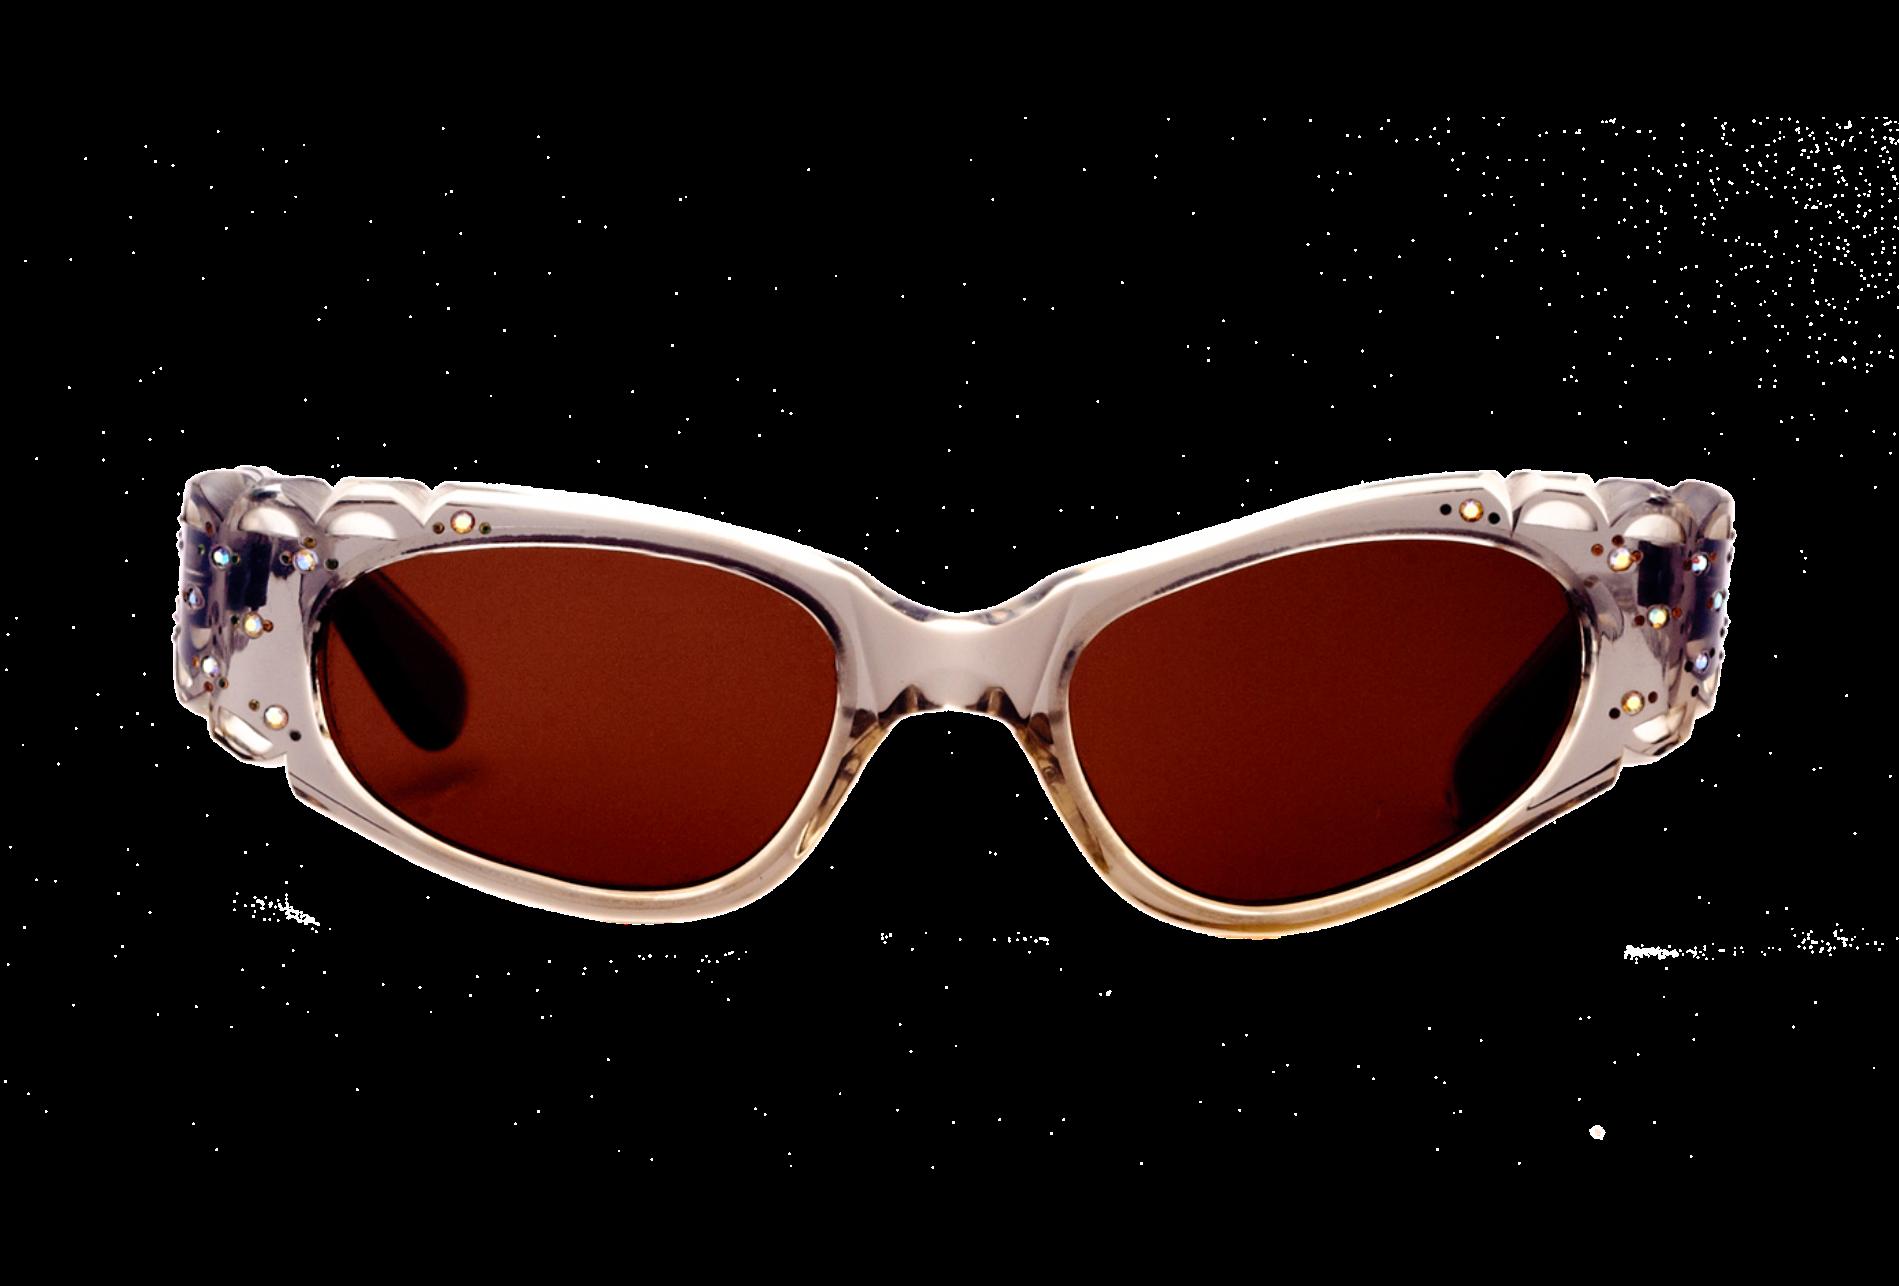 27109d65967 Transparent Background Glasses Png For Picsart  Download glasses png ...